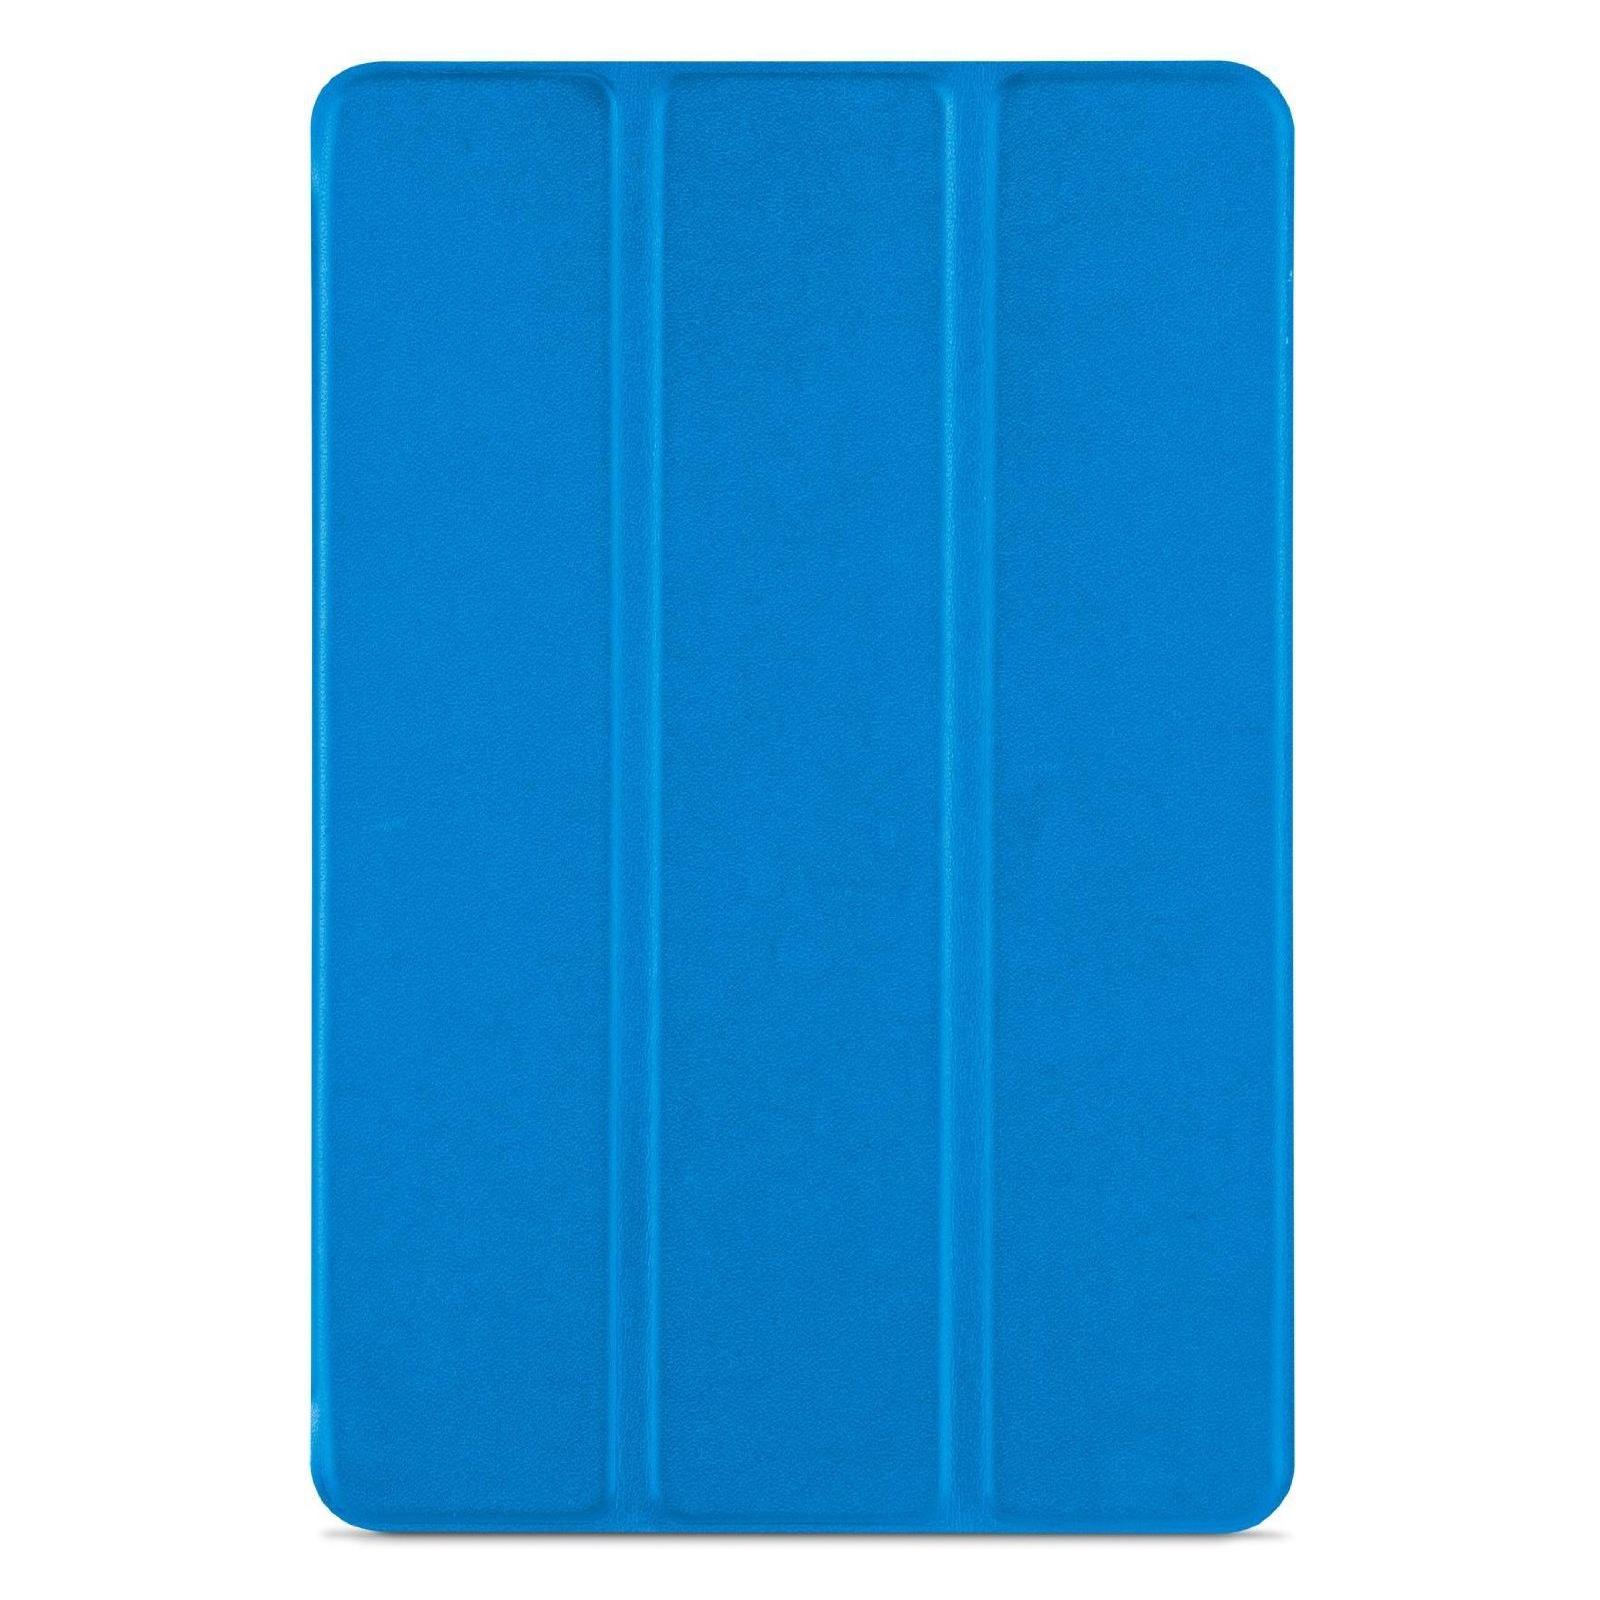 Чехол для планшета Belkin iPad mini LEGO Builder Case Red-Blue (F7N110B2C02) изображение 2